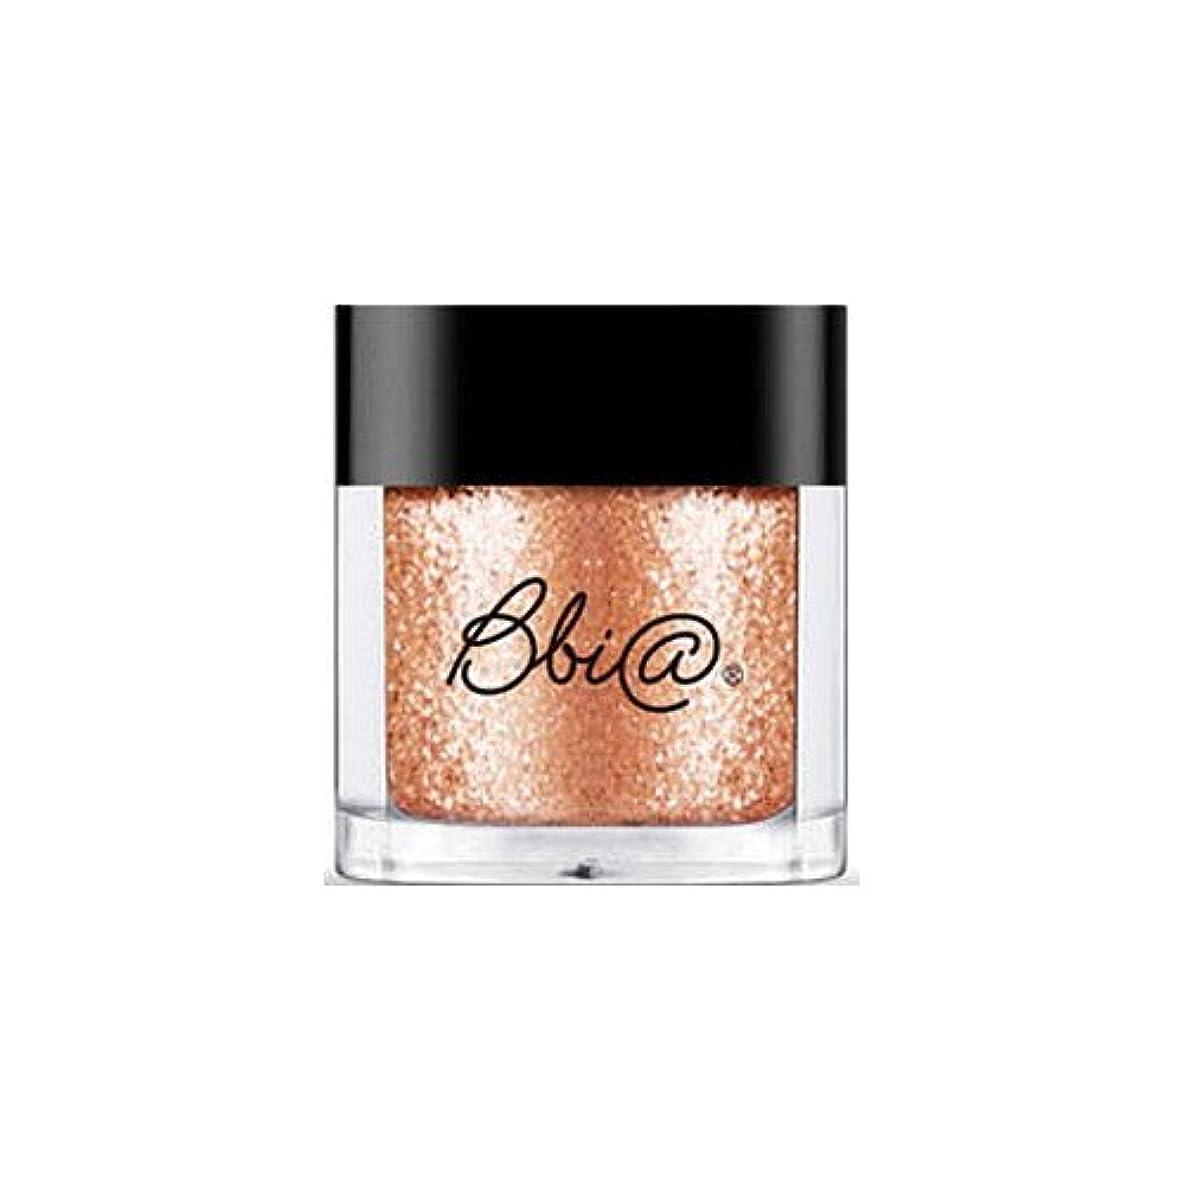 粒孤独な変更可能(3 Pack) BBIA Pigment - #03 Sour taste (並行輸入品)